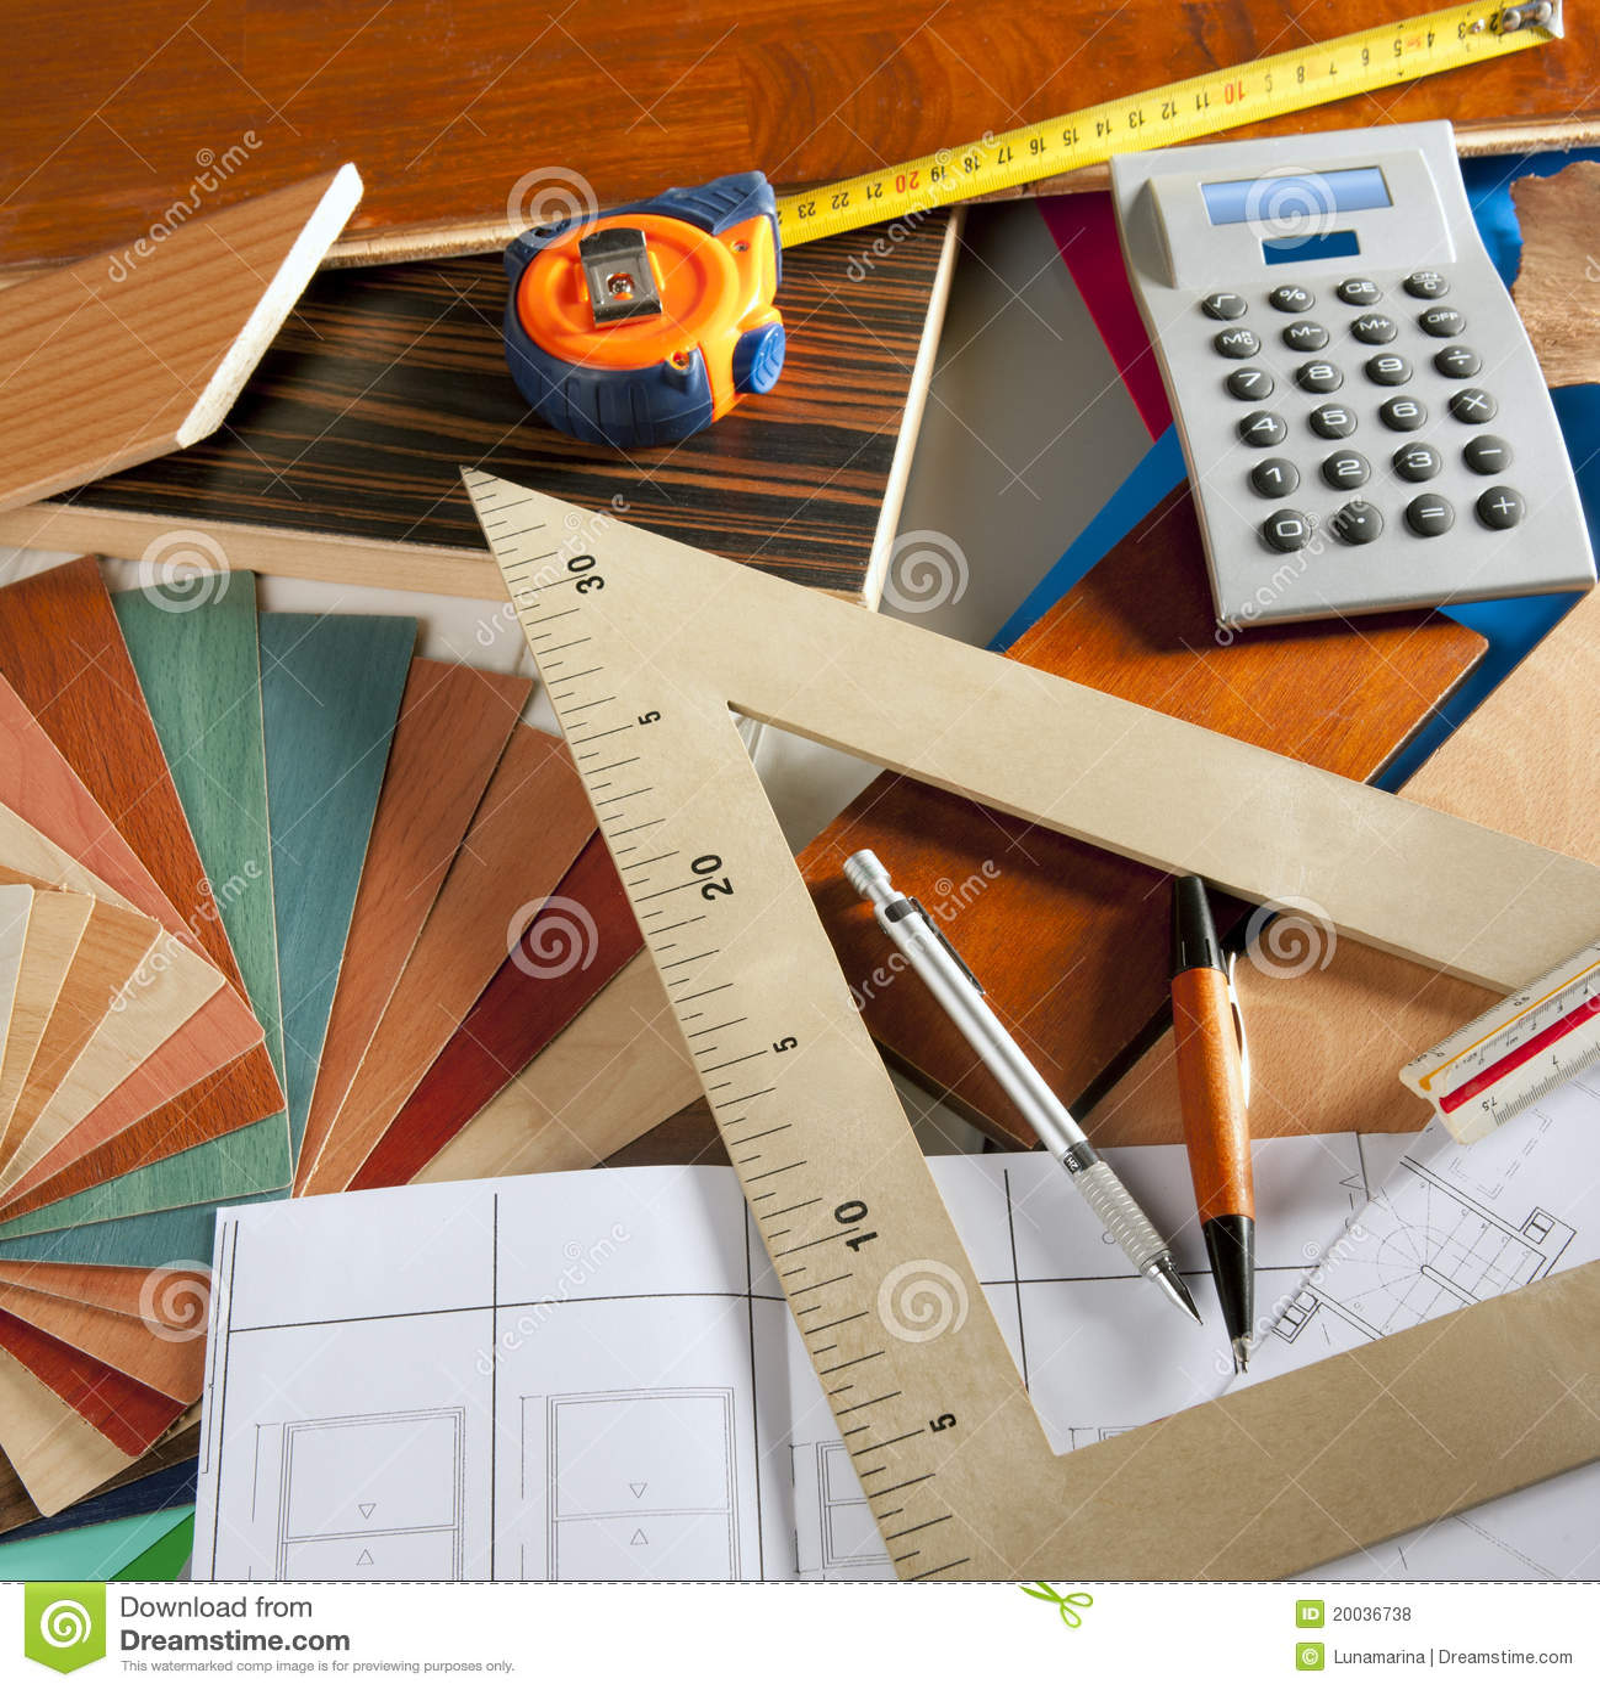 Architect interior designer carpenter royalty free stock for Interior design tools online